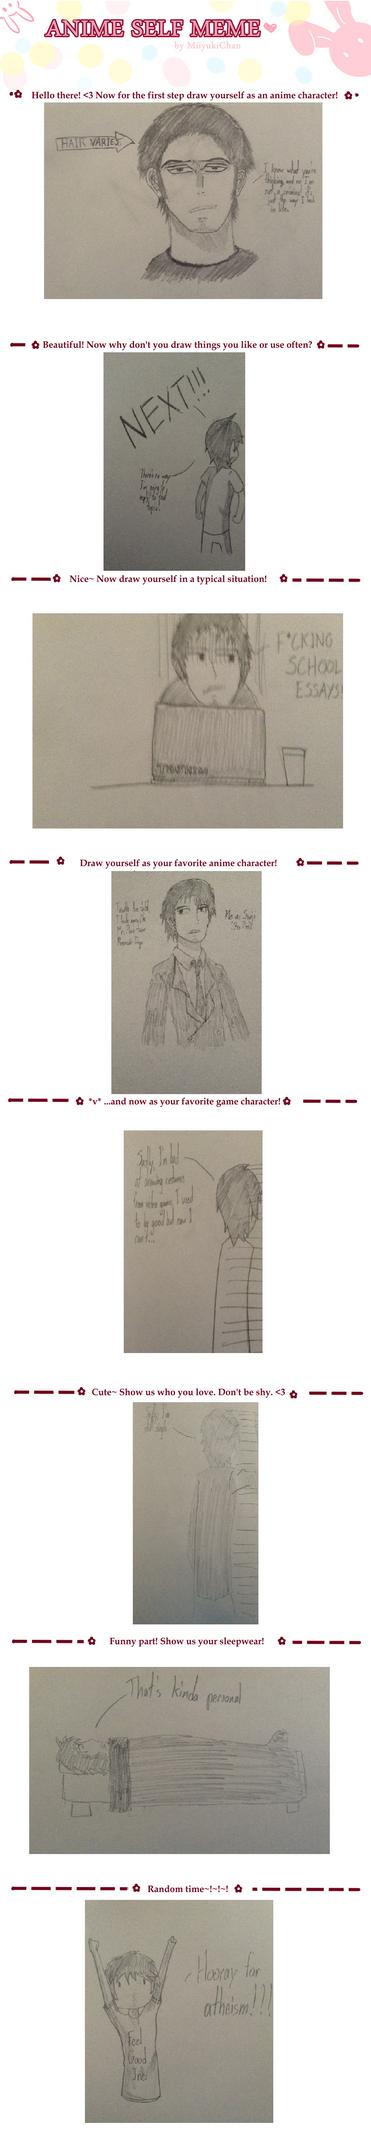 Anime Self Meme by KeybladeDesigner15